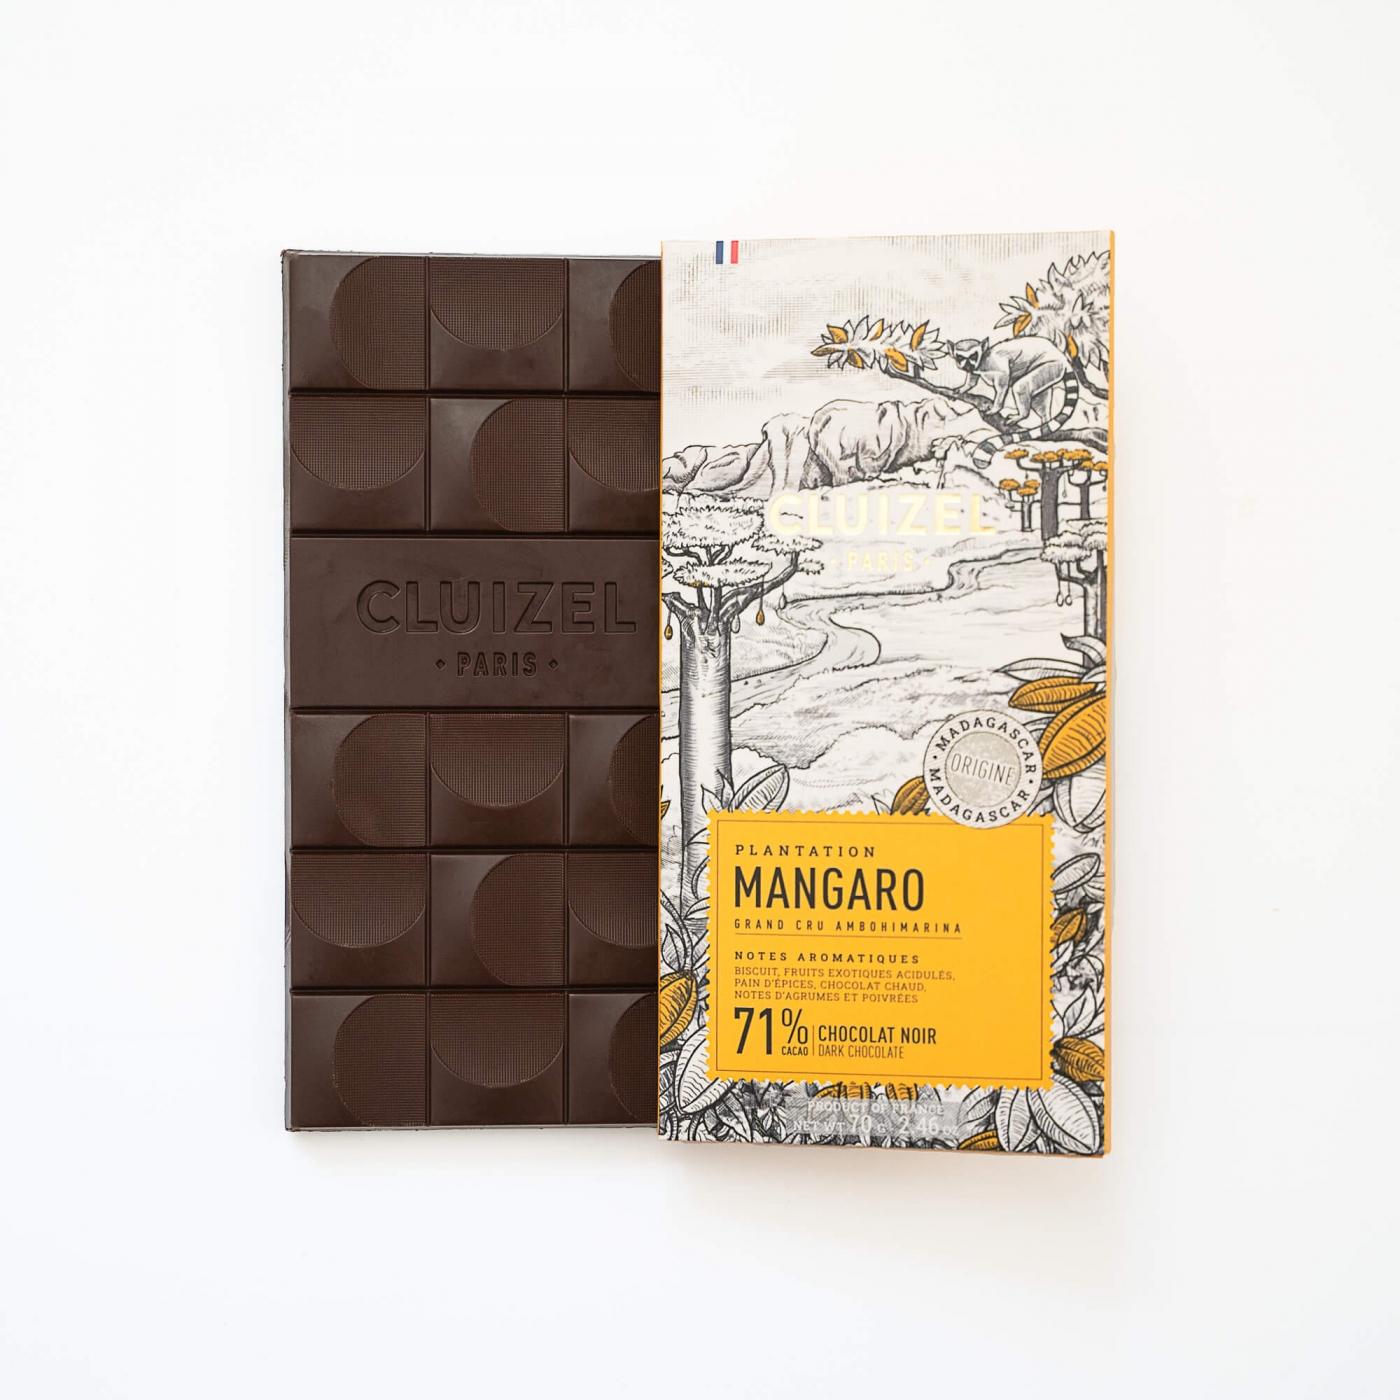 tablette mangaro cluizel 2021